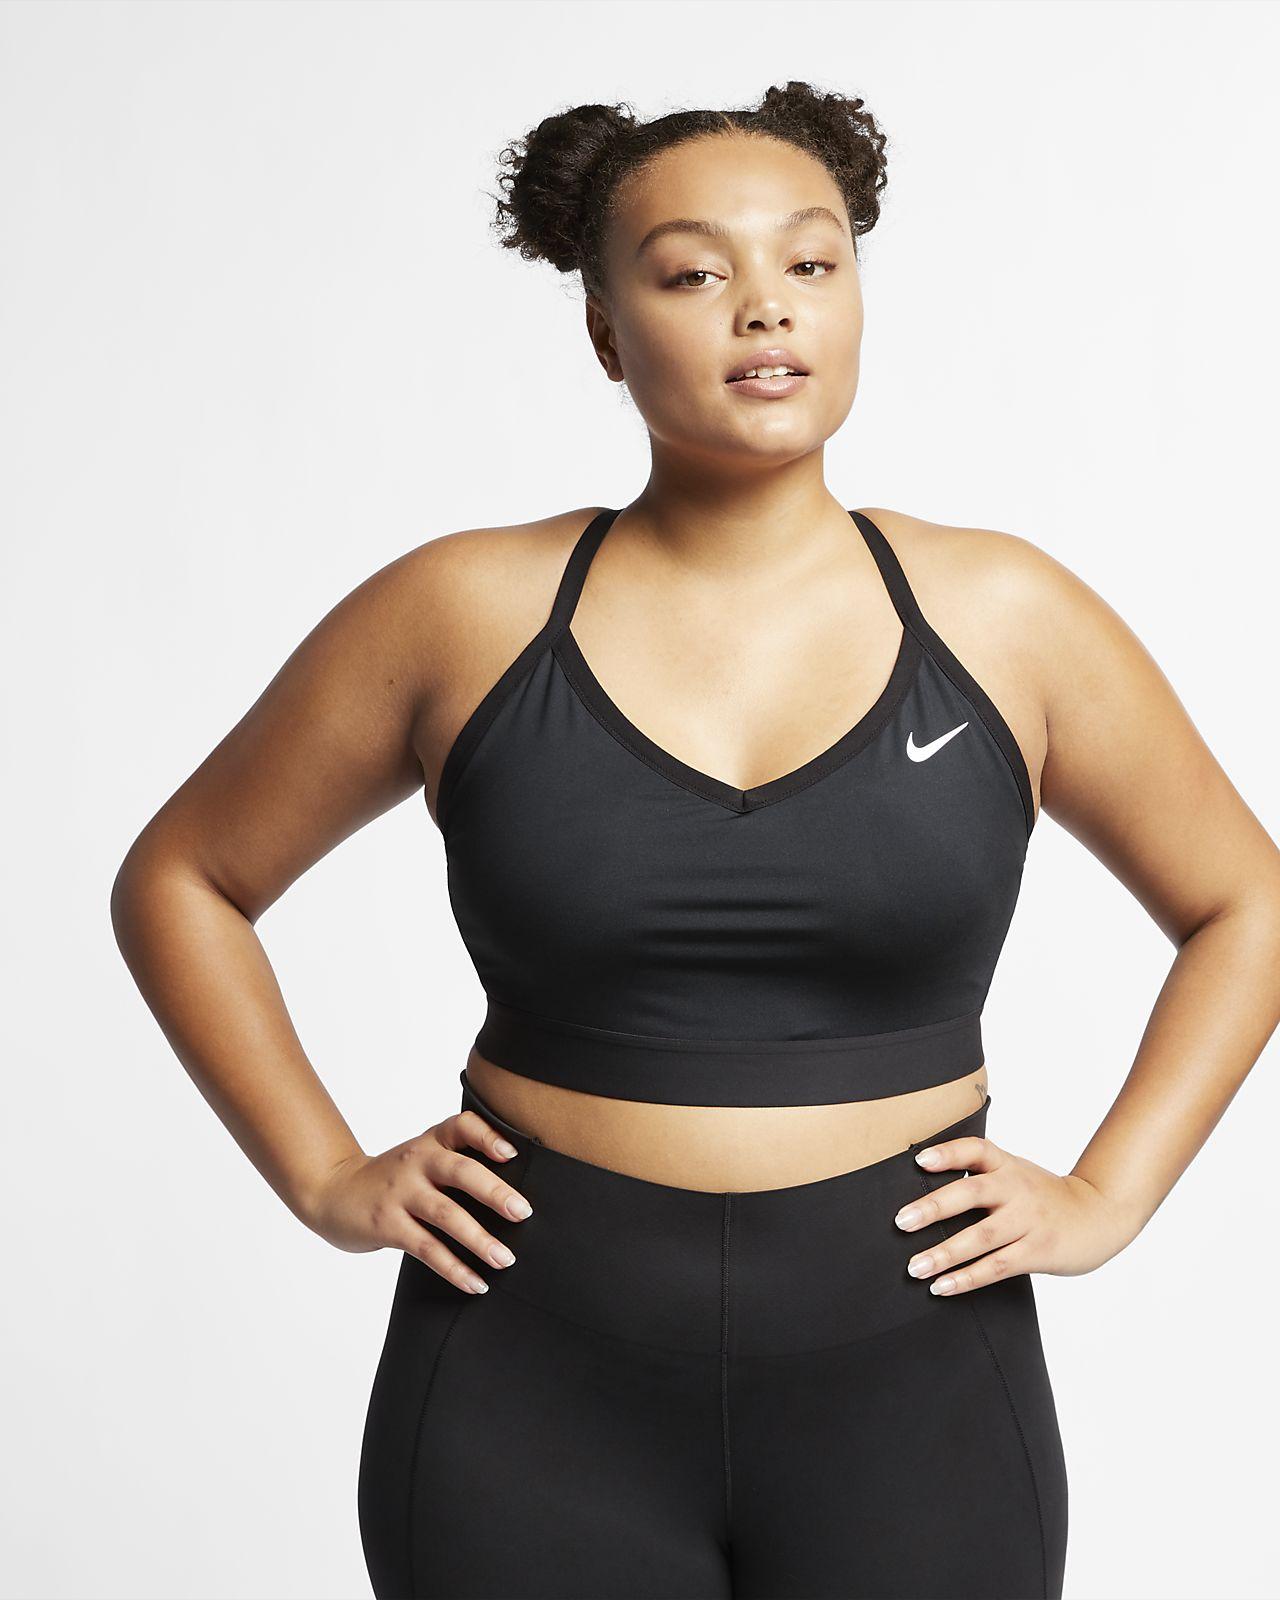 Nike Dri-FIT Indy Gewatteerde sport-bh met lichte ondersteuning (grote maten)